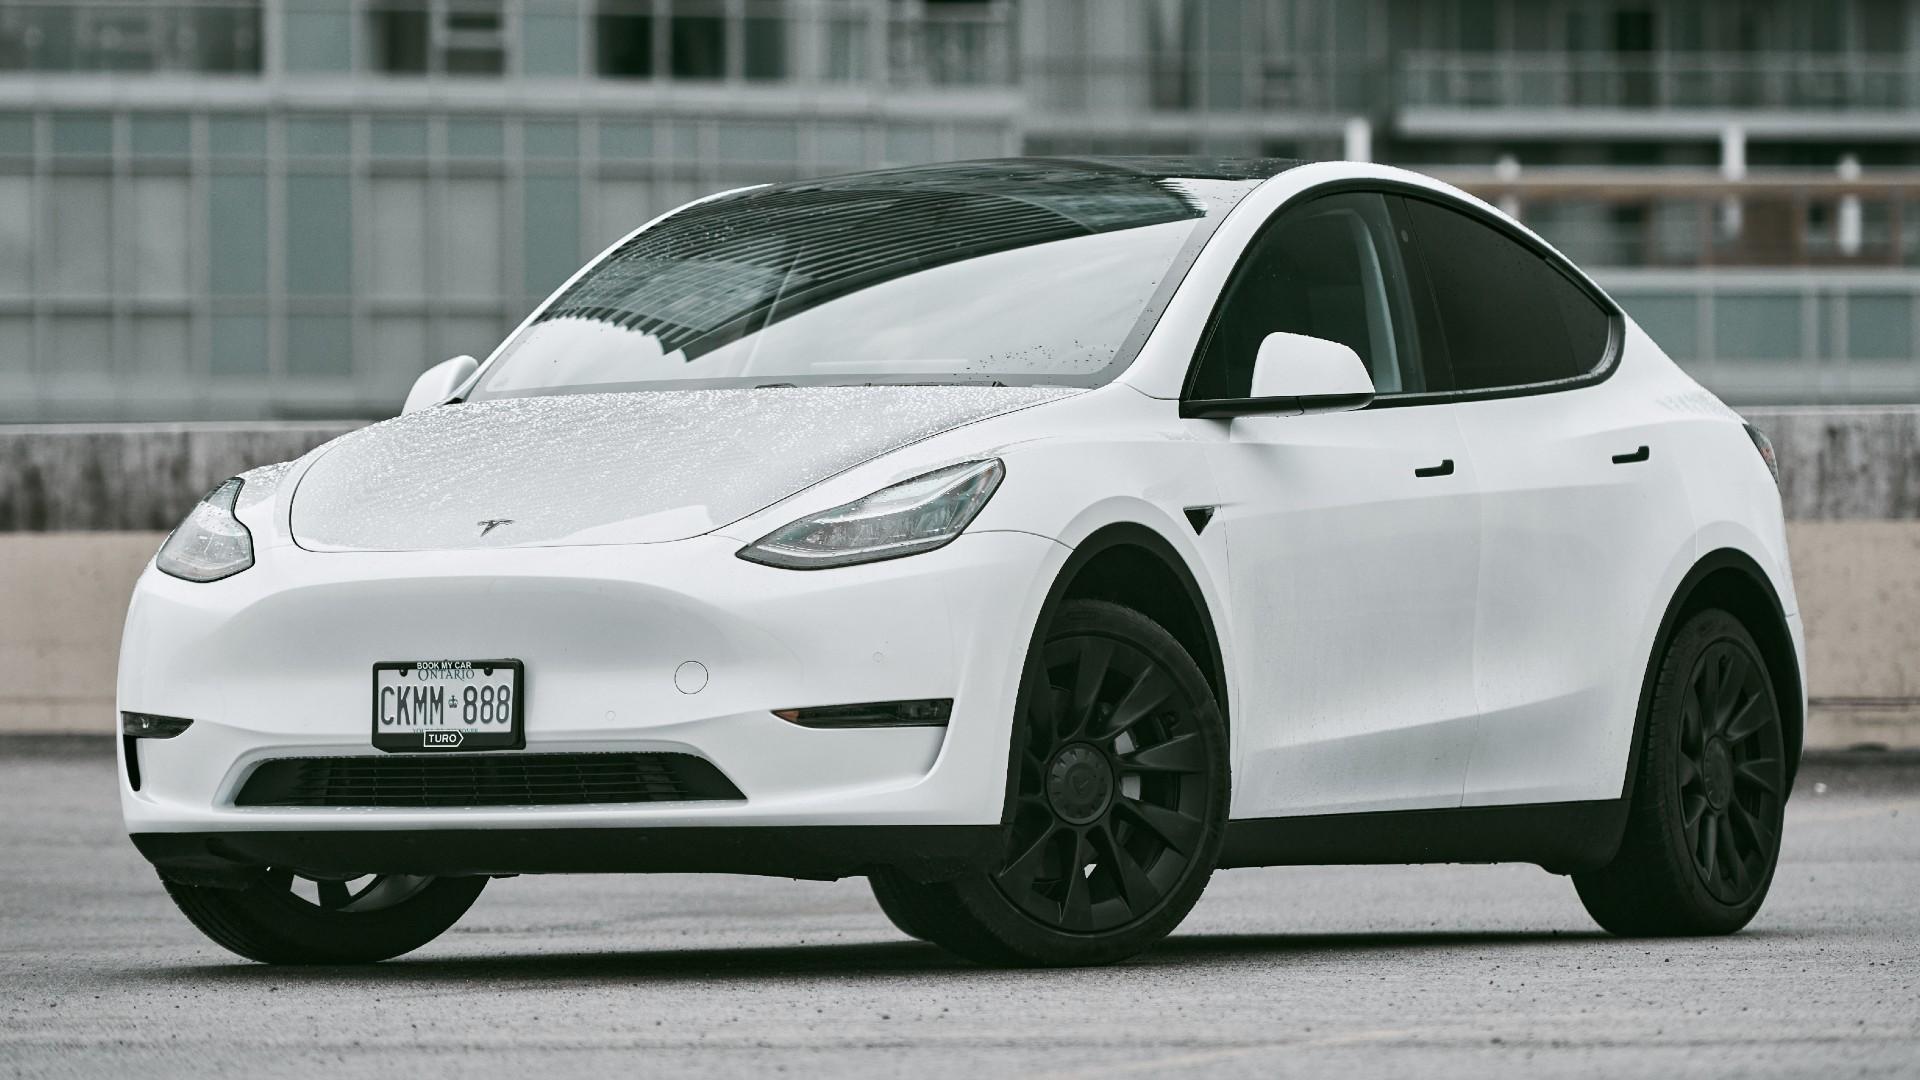 H Tesla λέει ότι το Model Y θα είναι το επόμενο παγκόσμιο best seller